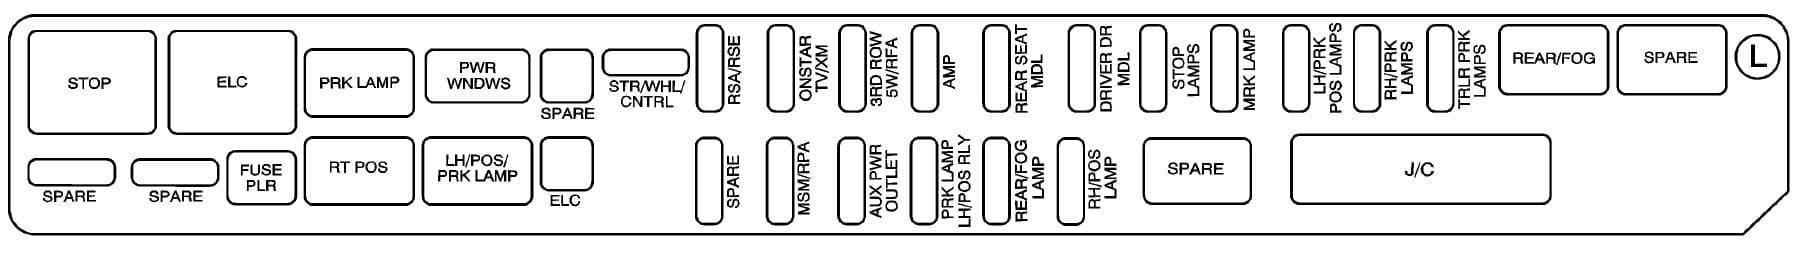 Cadillac SRX mk1 - fuse box - rear compartment (left side)